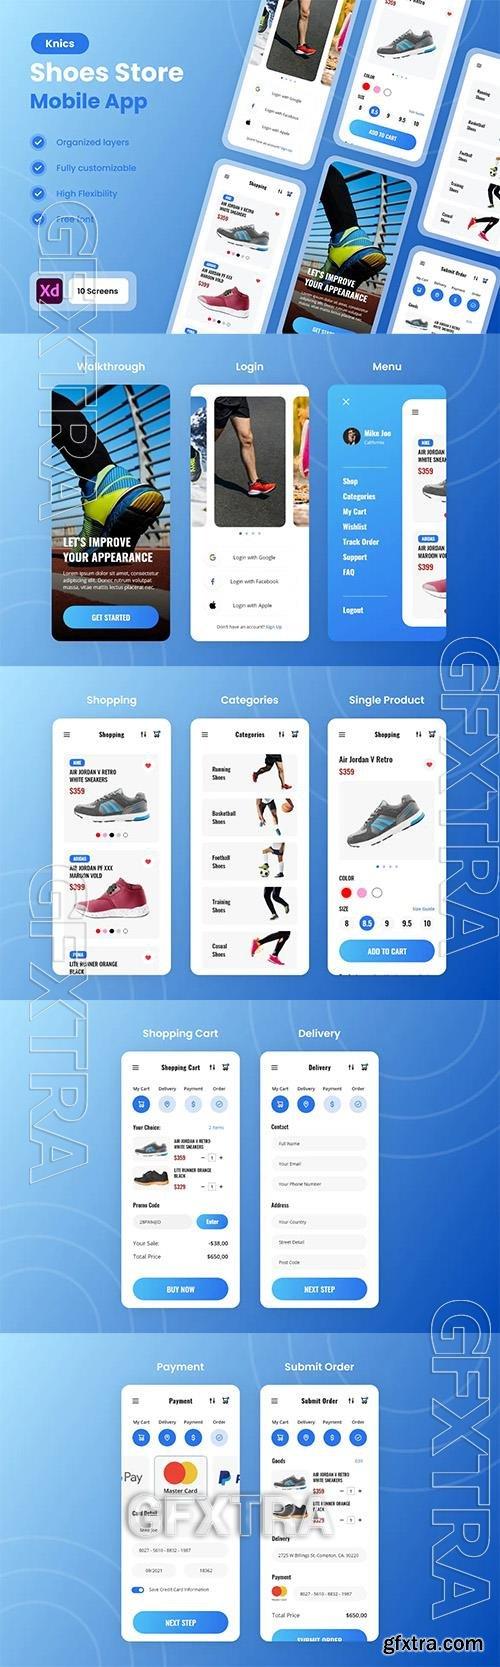 Knic - Shoes & Sneakers Store Mobile App UI Kit XV7TBTD